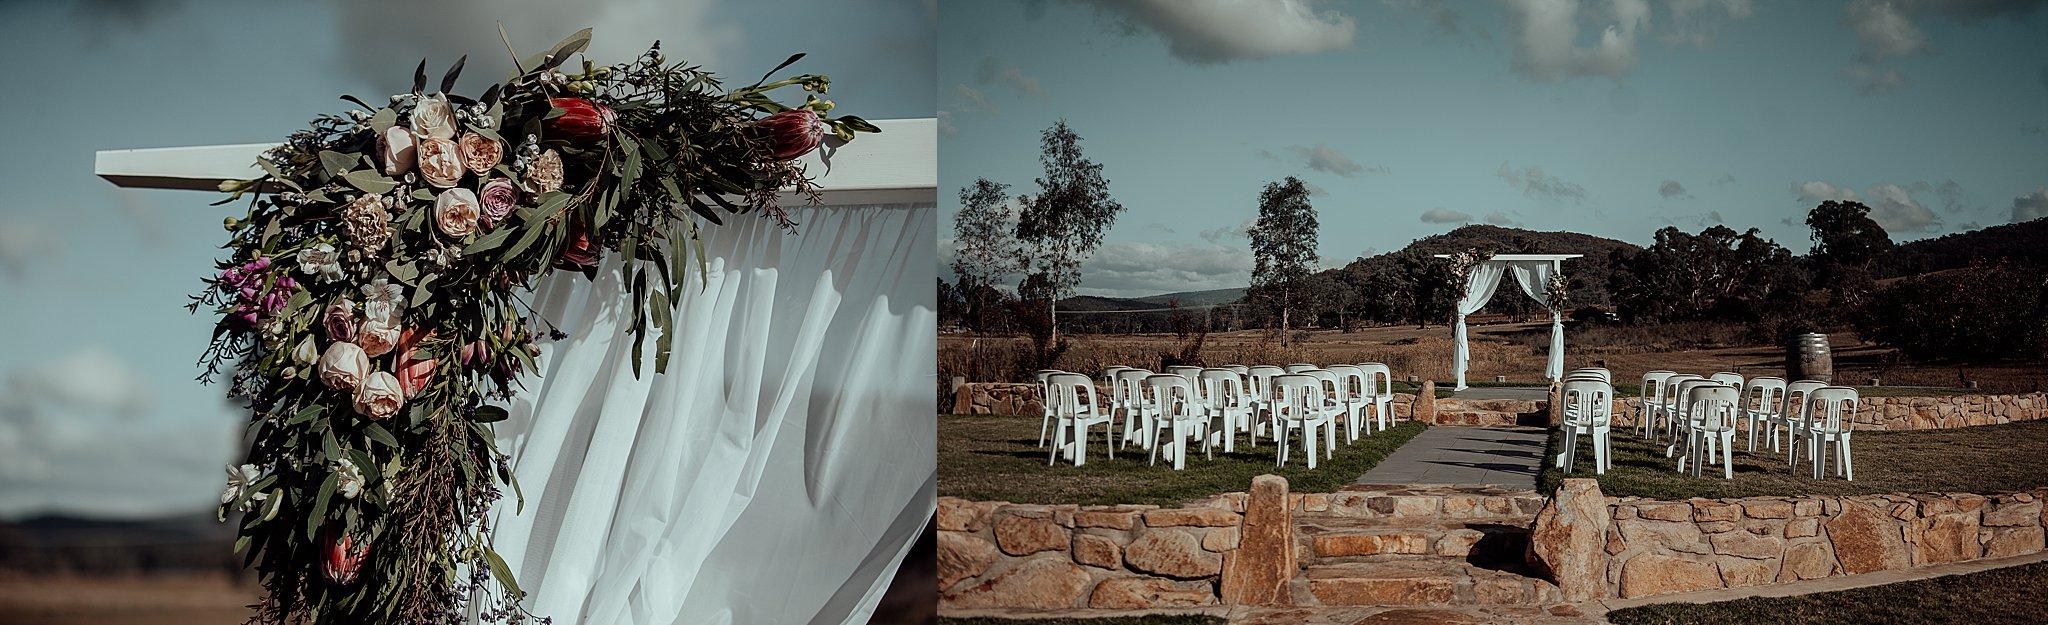 mickalathomas_puremacphotography_weddingphotographer_couplephotographer_Sheppartonphotographer_3426.jpg